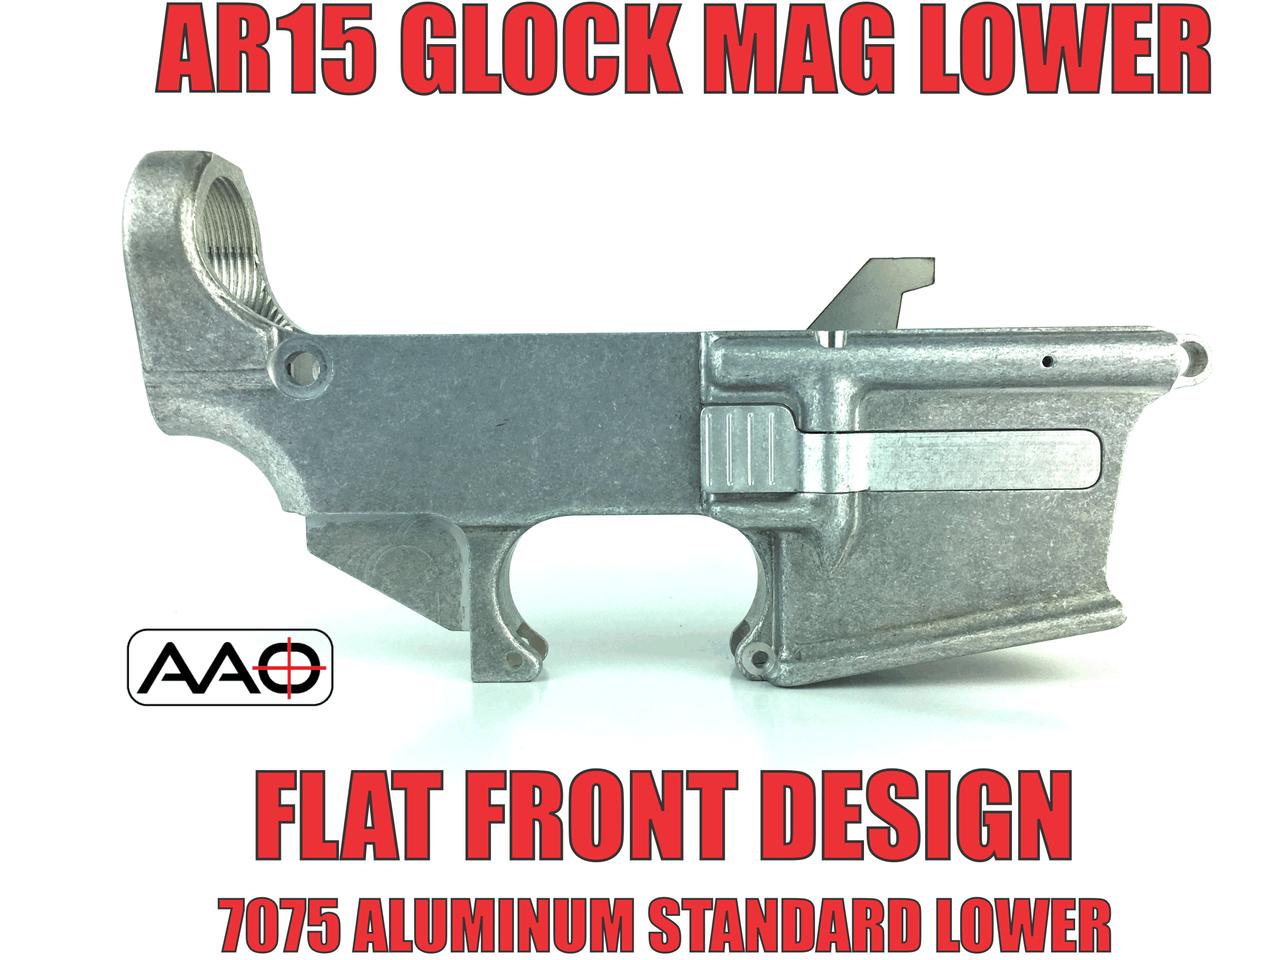 80% AR9/AR40 - Glock Magazine - Standard Lower - Flat Front - 7075 Raw (No  LRBHO)